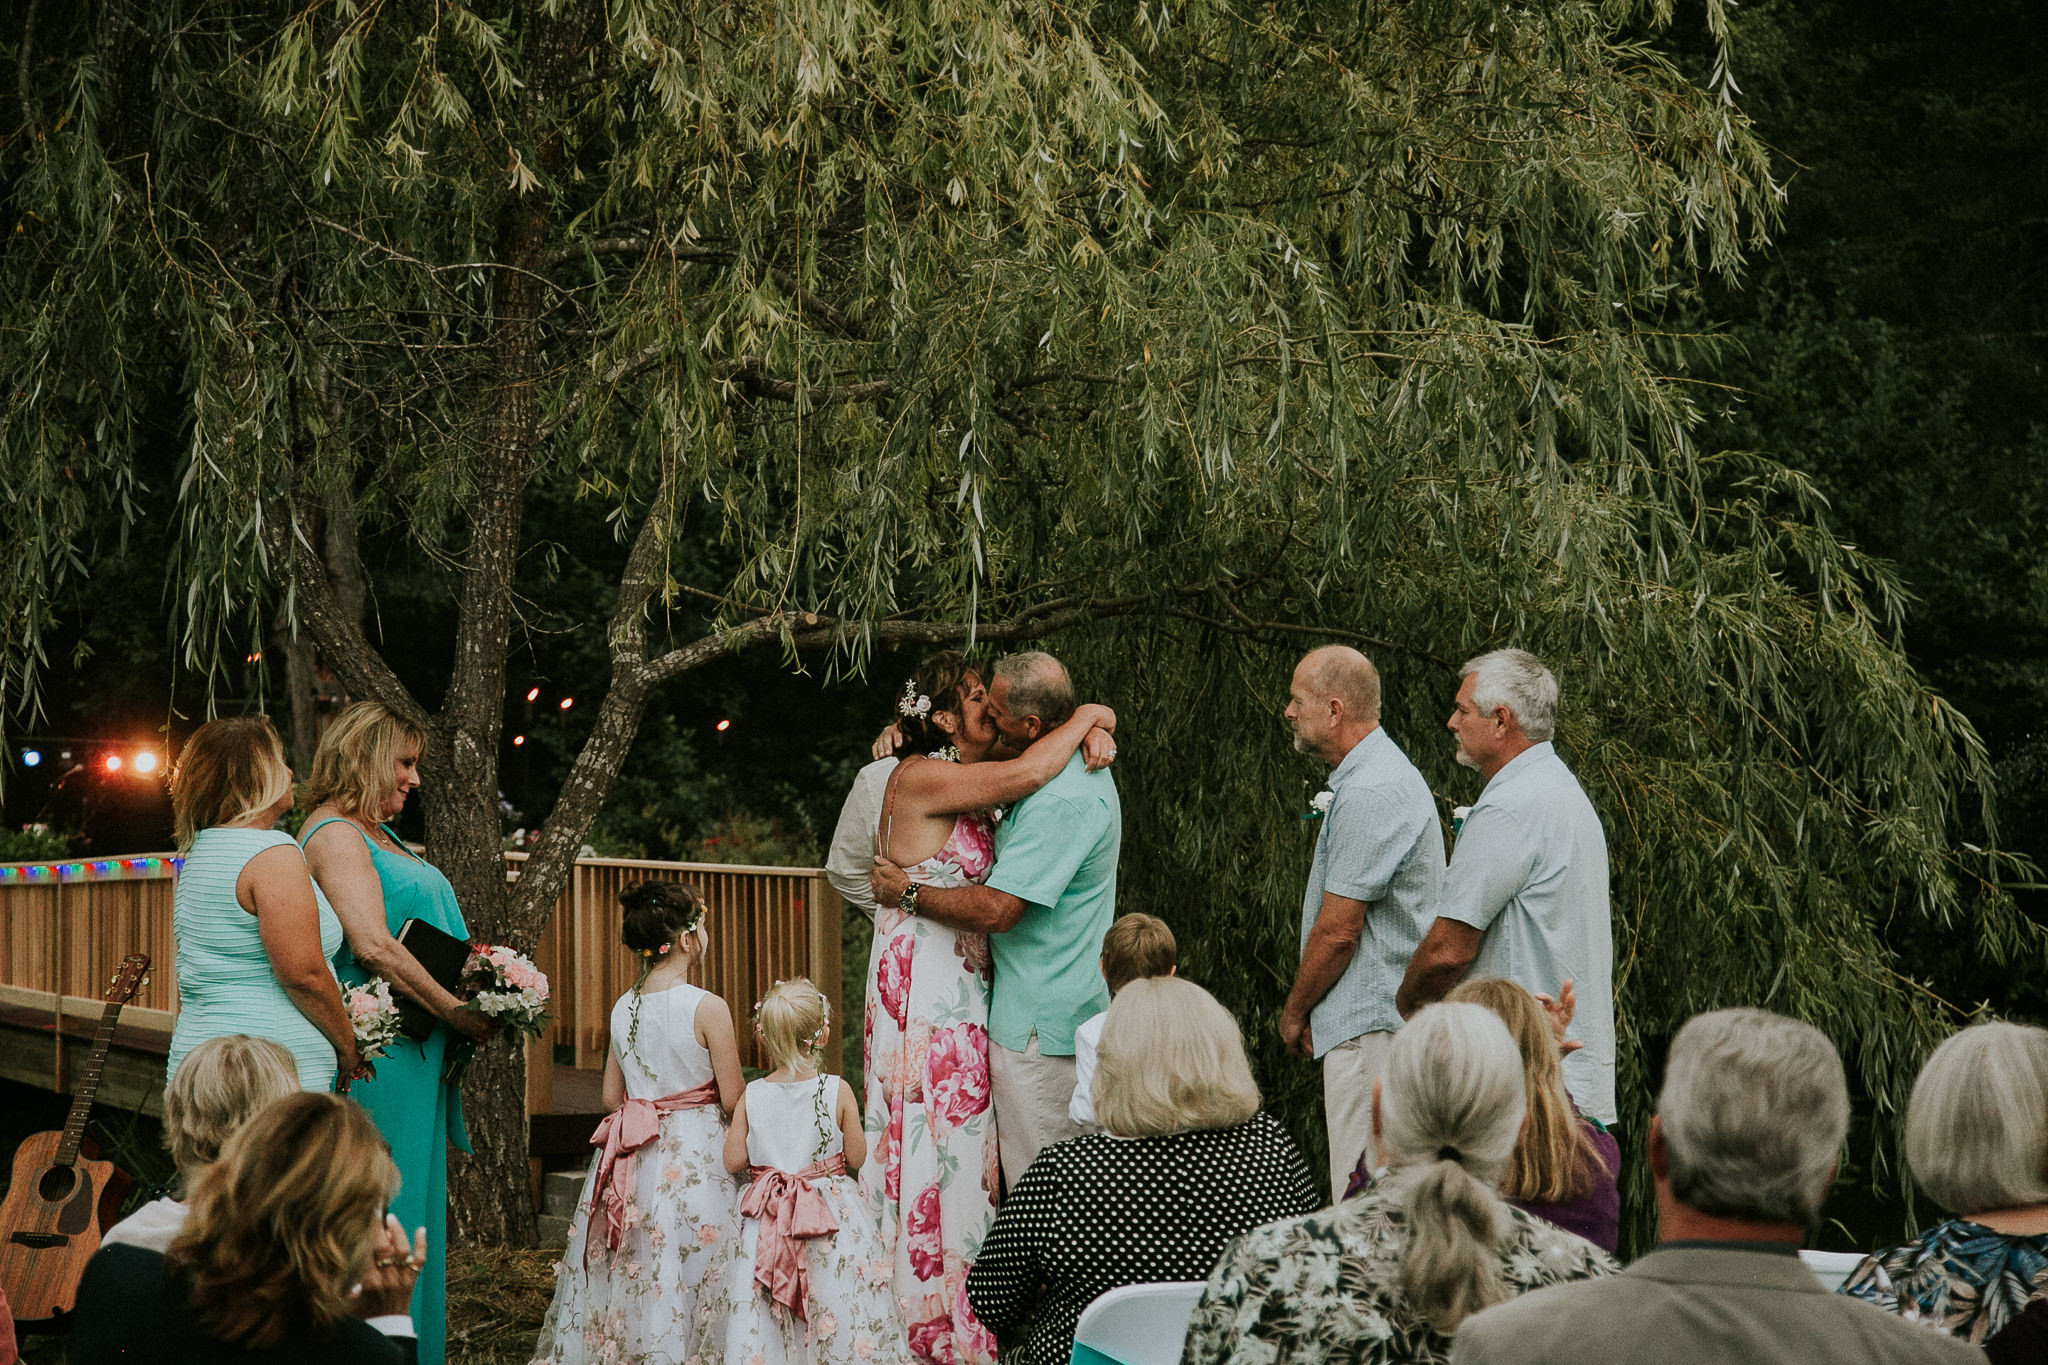 Backyard-Elopement-Ceremony-100.jpg